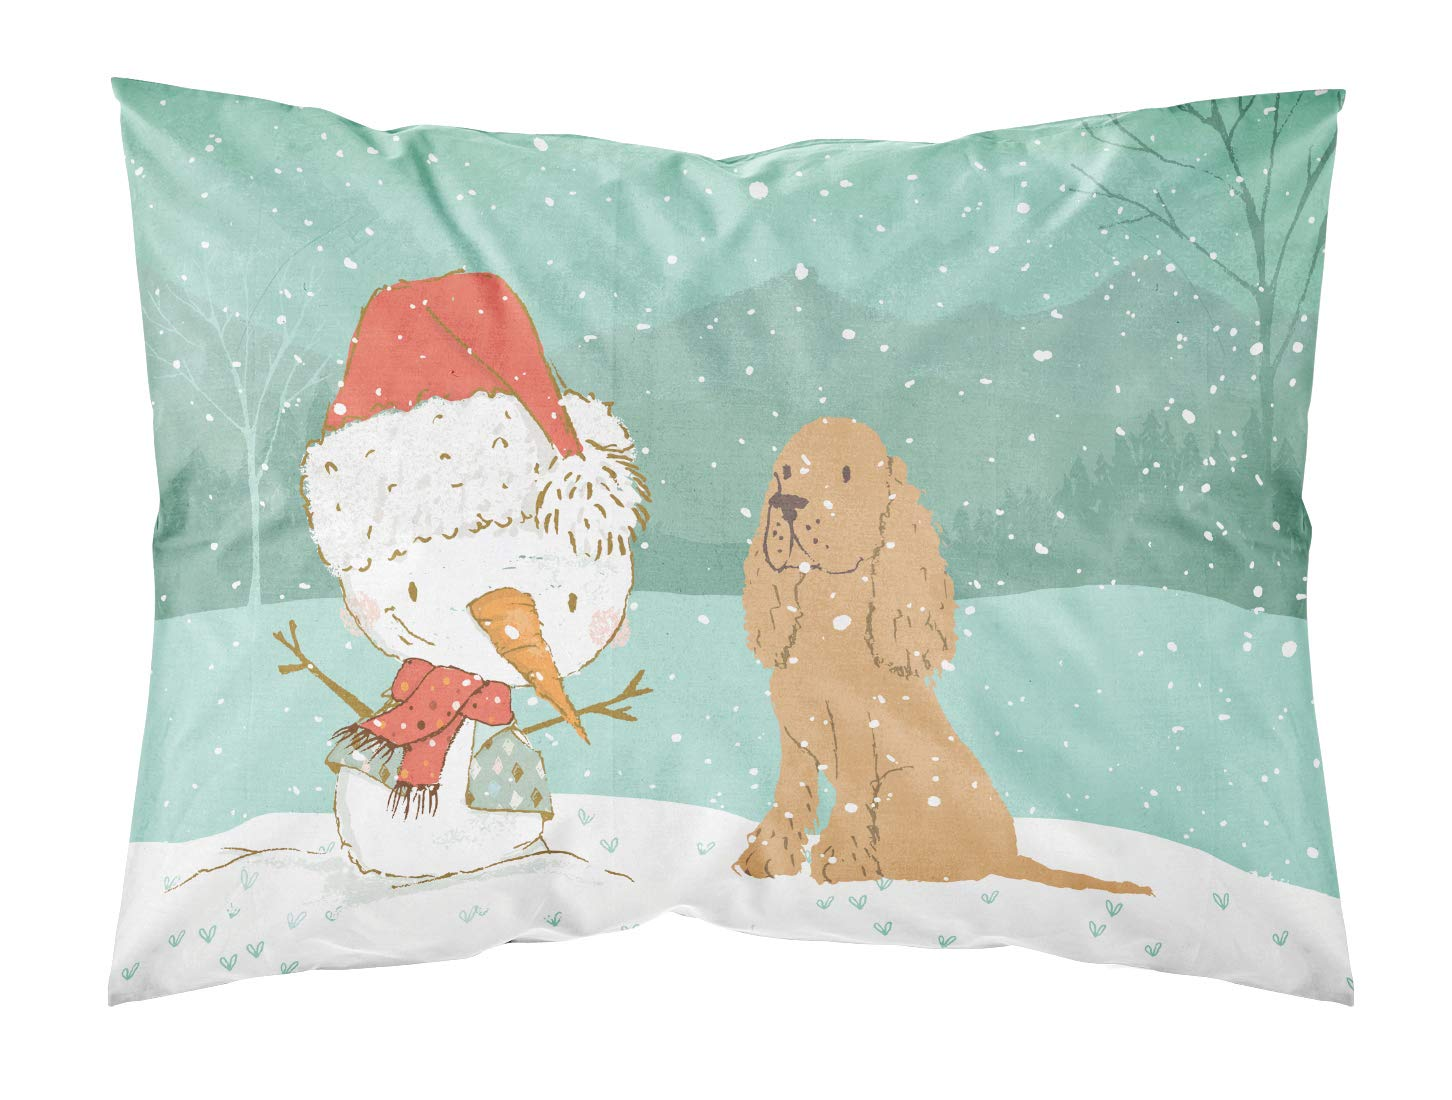 Carolines Treasures Tan Spaniel Snowman Christmas Fabric Standard Pillowcase Multicolor